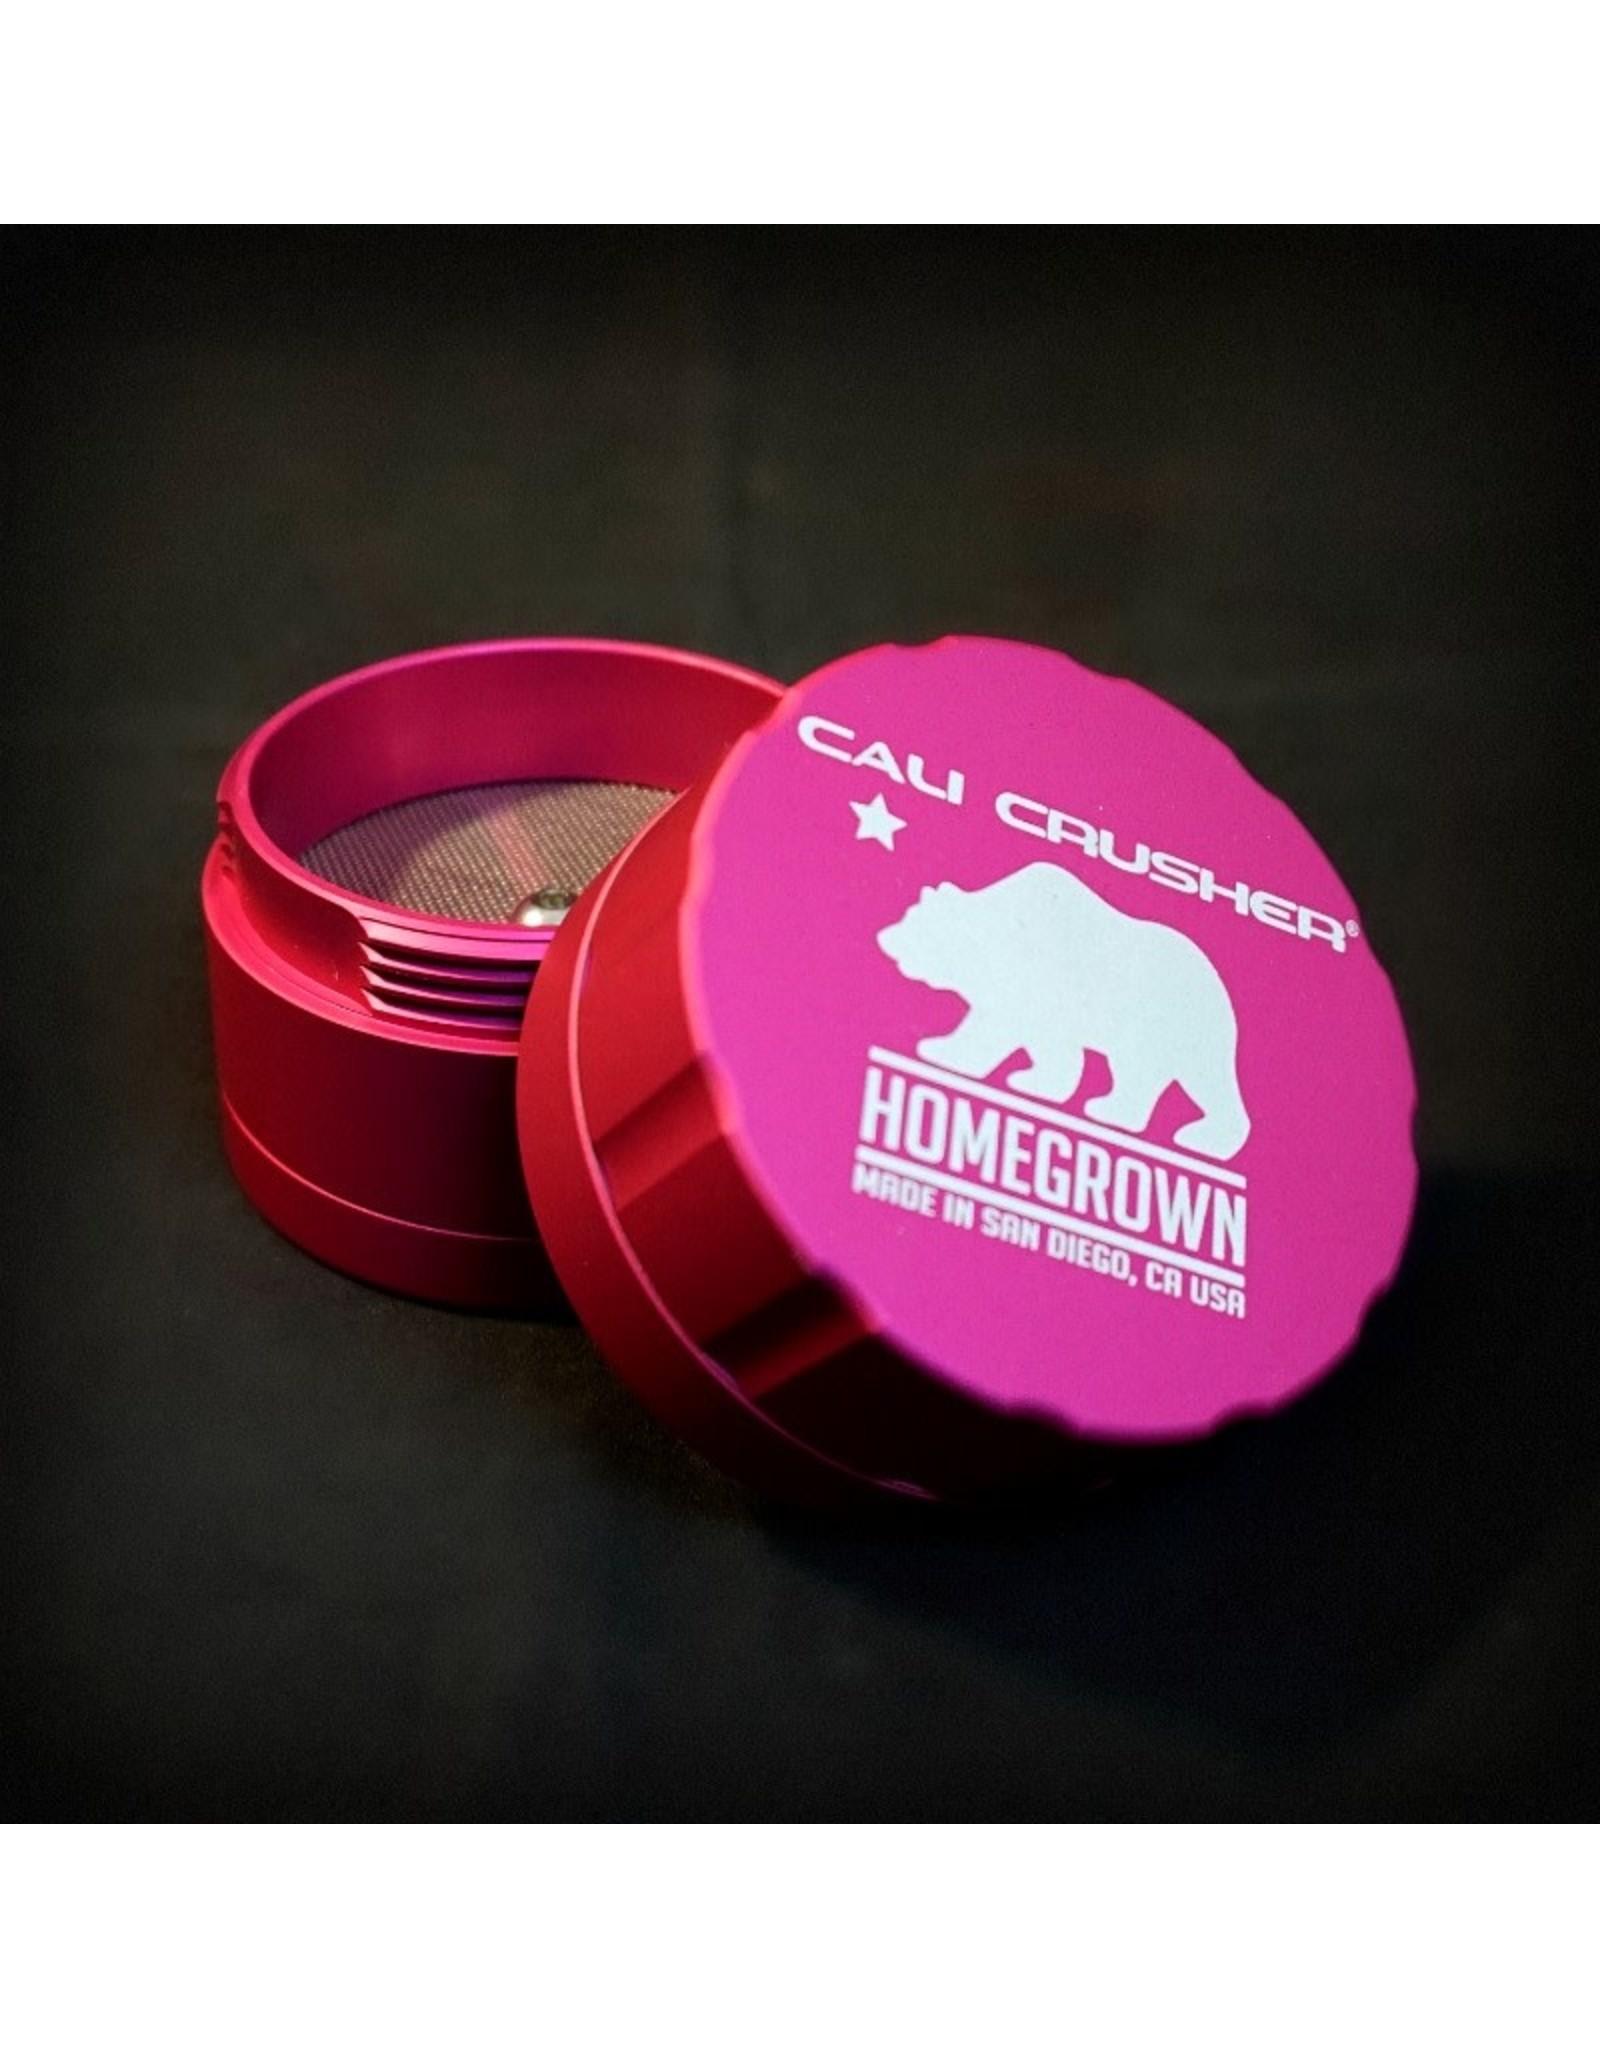 Cali Crusher Cali Crusher Homegrown 4pc Large - Pink